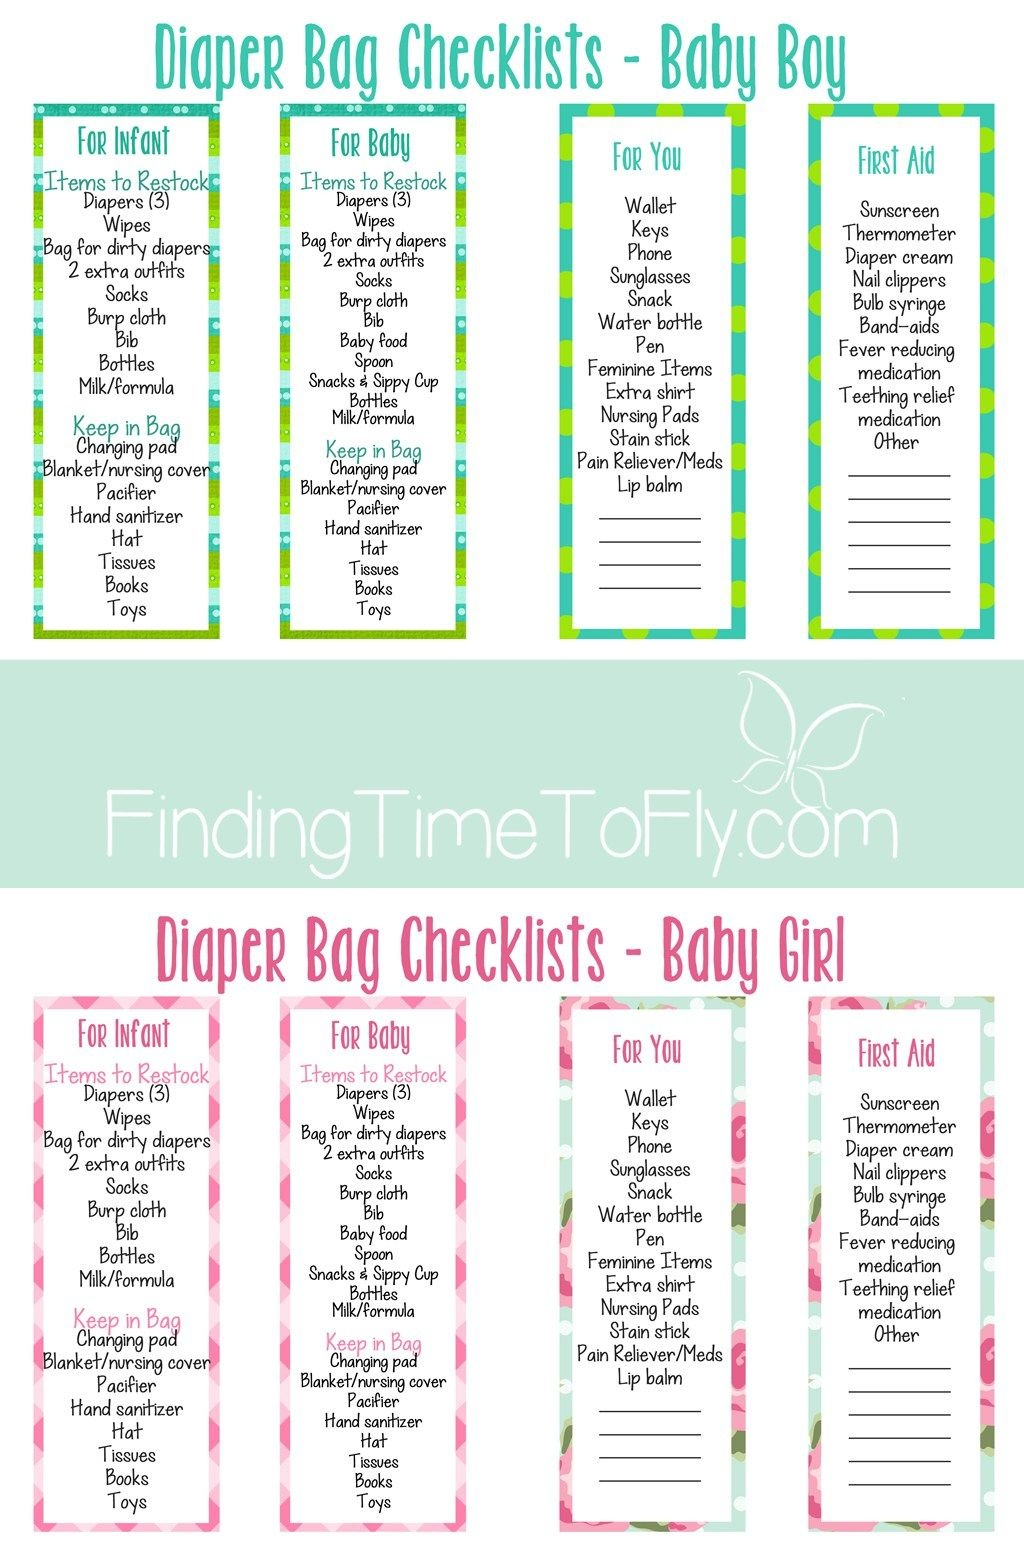 Diaper Bag Checklist | New Baby | Diaper Bag Checklist, Baby Diaper - What's In The Diaper Bag Game Free Printable